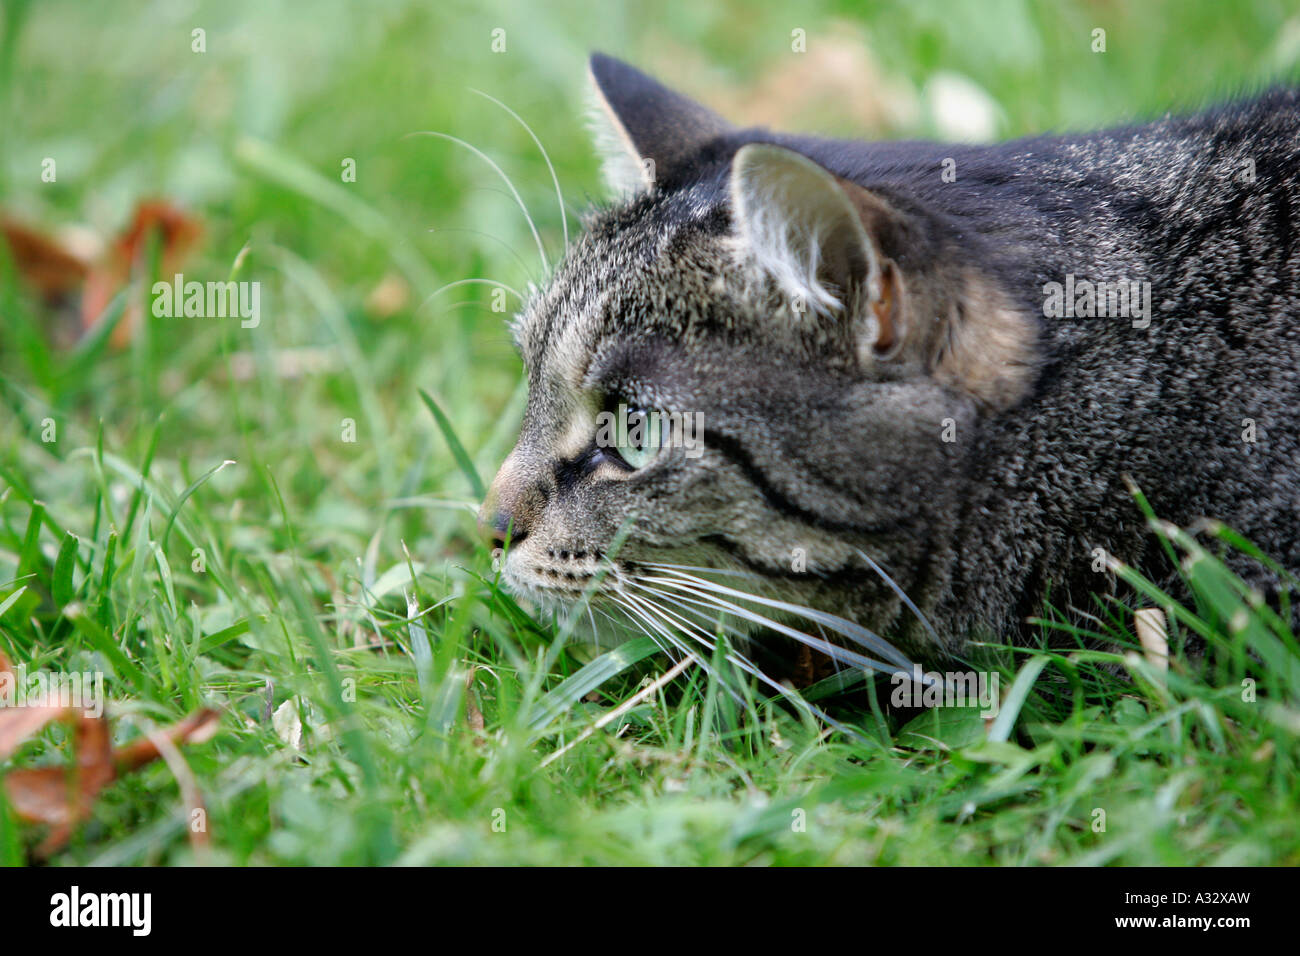 Cat lurking in a garden Stock Photo